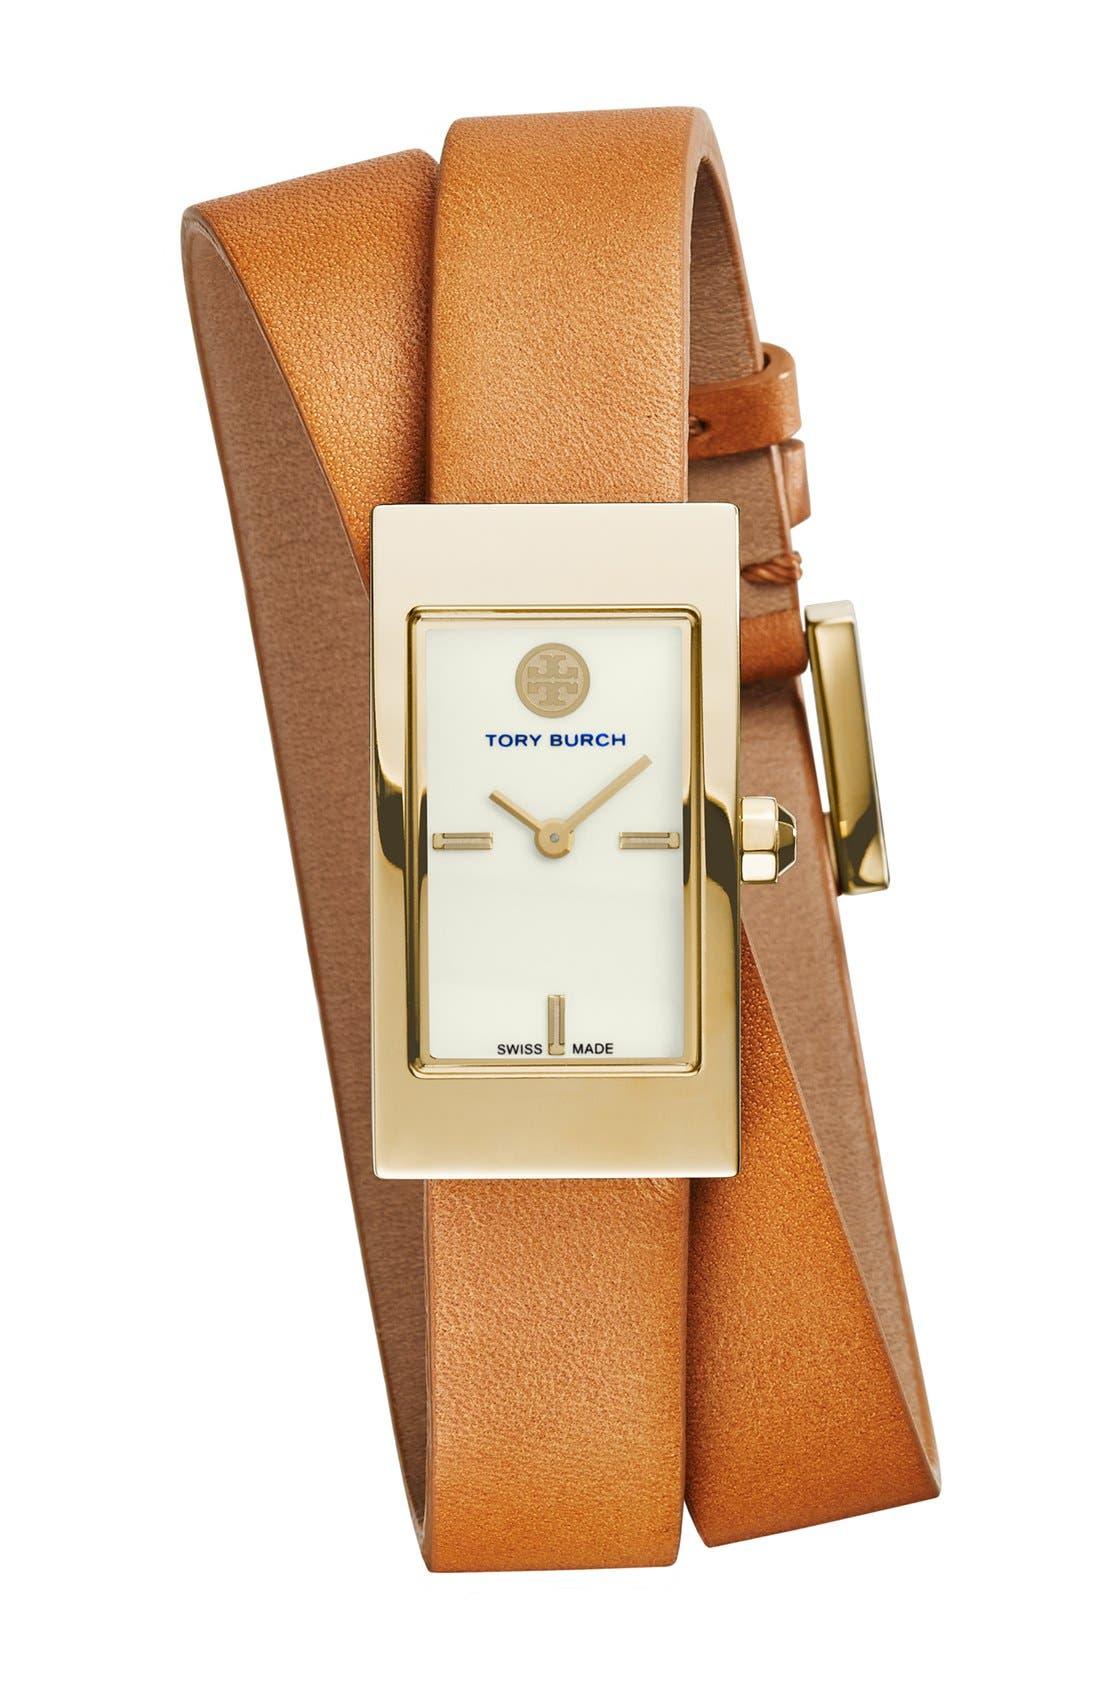 Main Image - Tory Burch 'Buddy Signature' Rectangular Wrap Leather Strap Watch, 17mm x 31mm